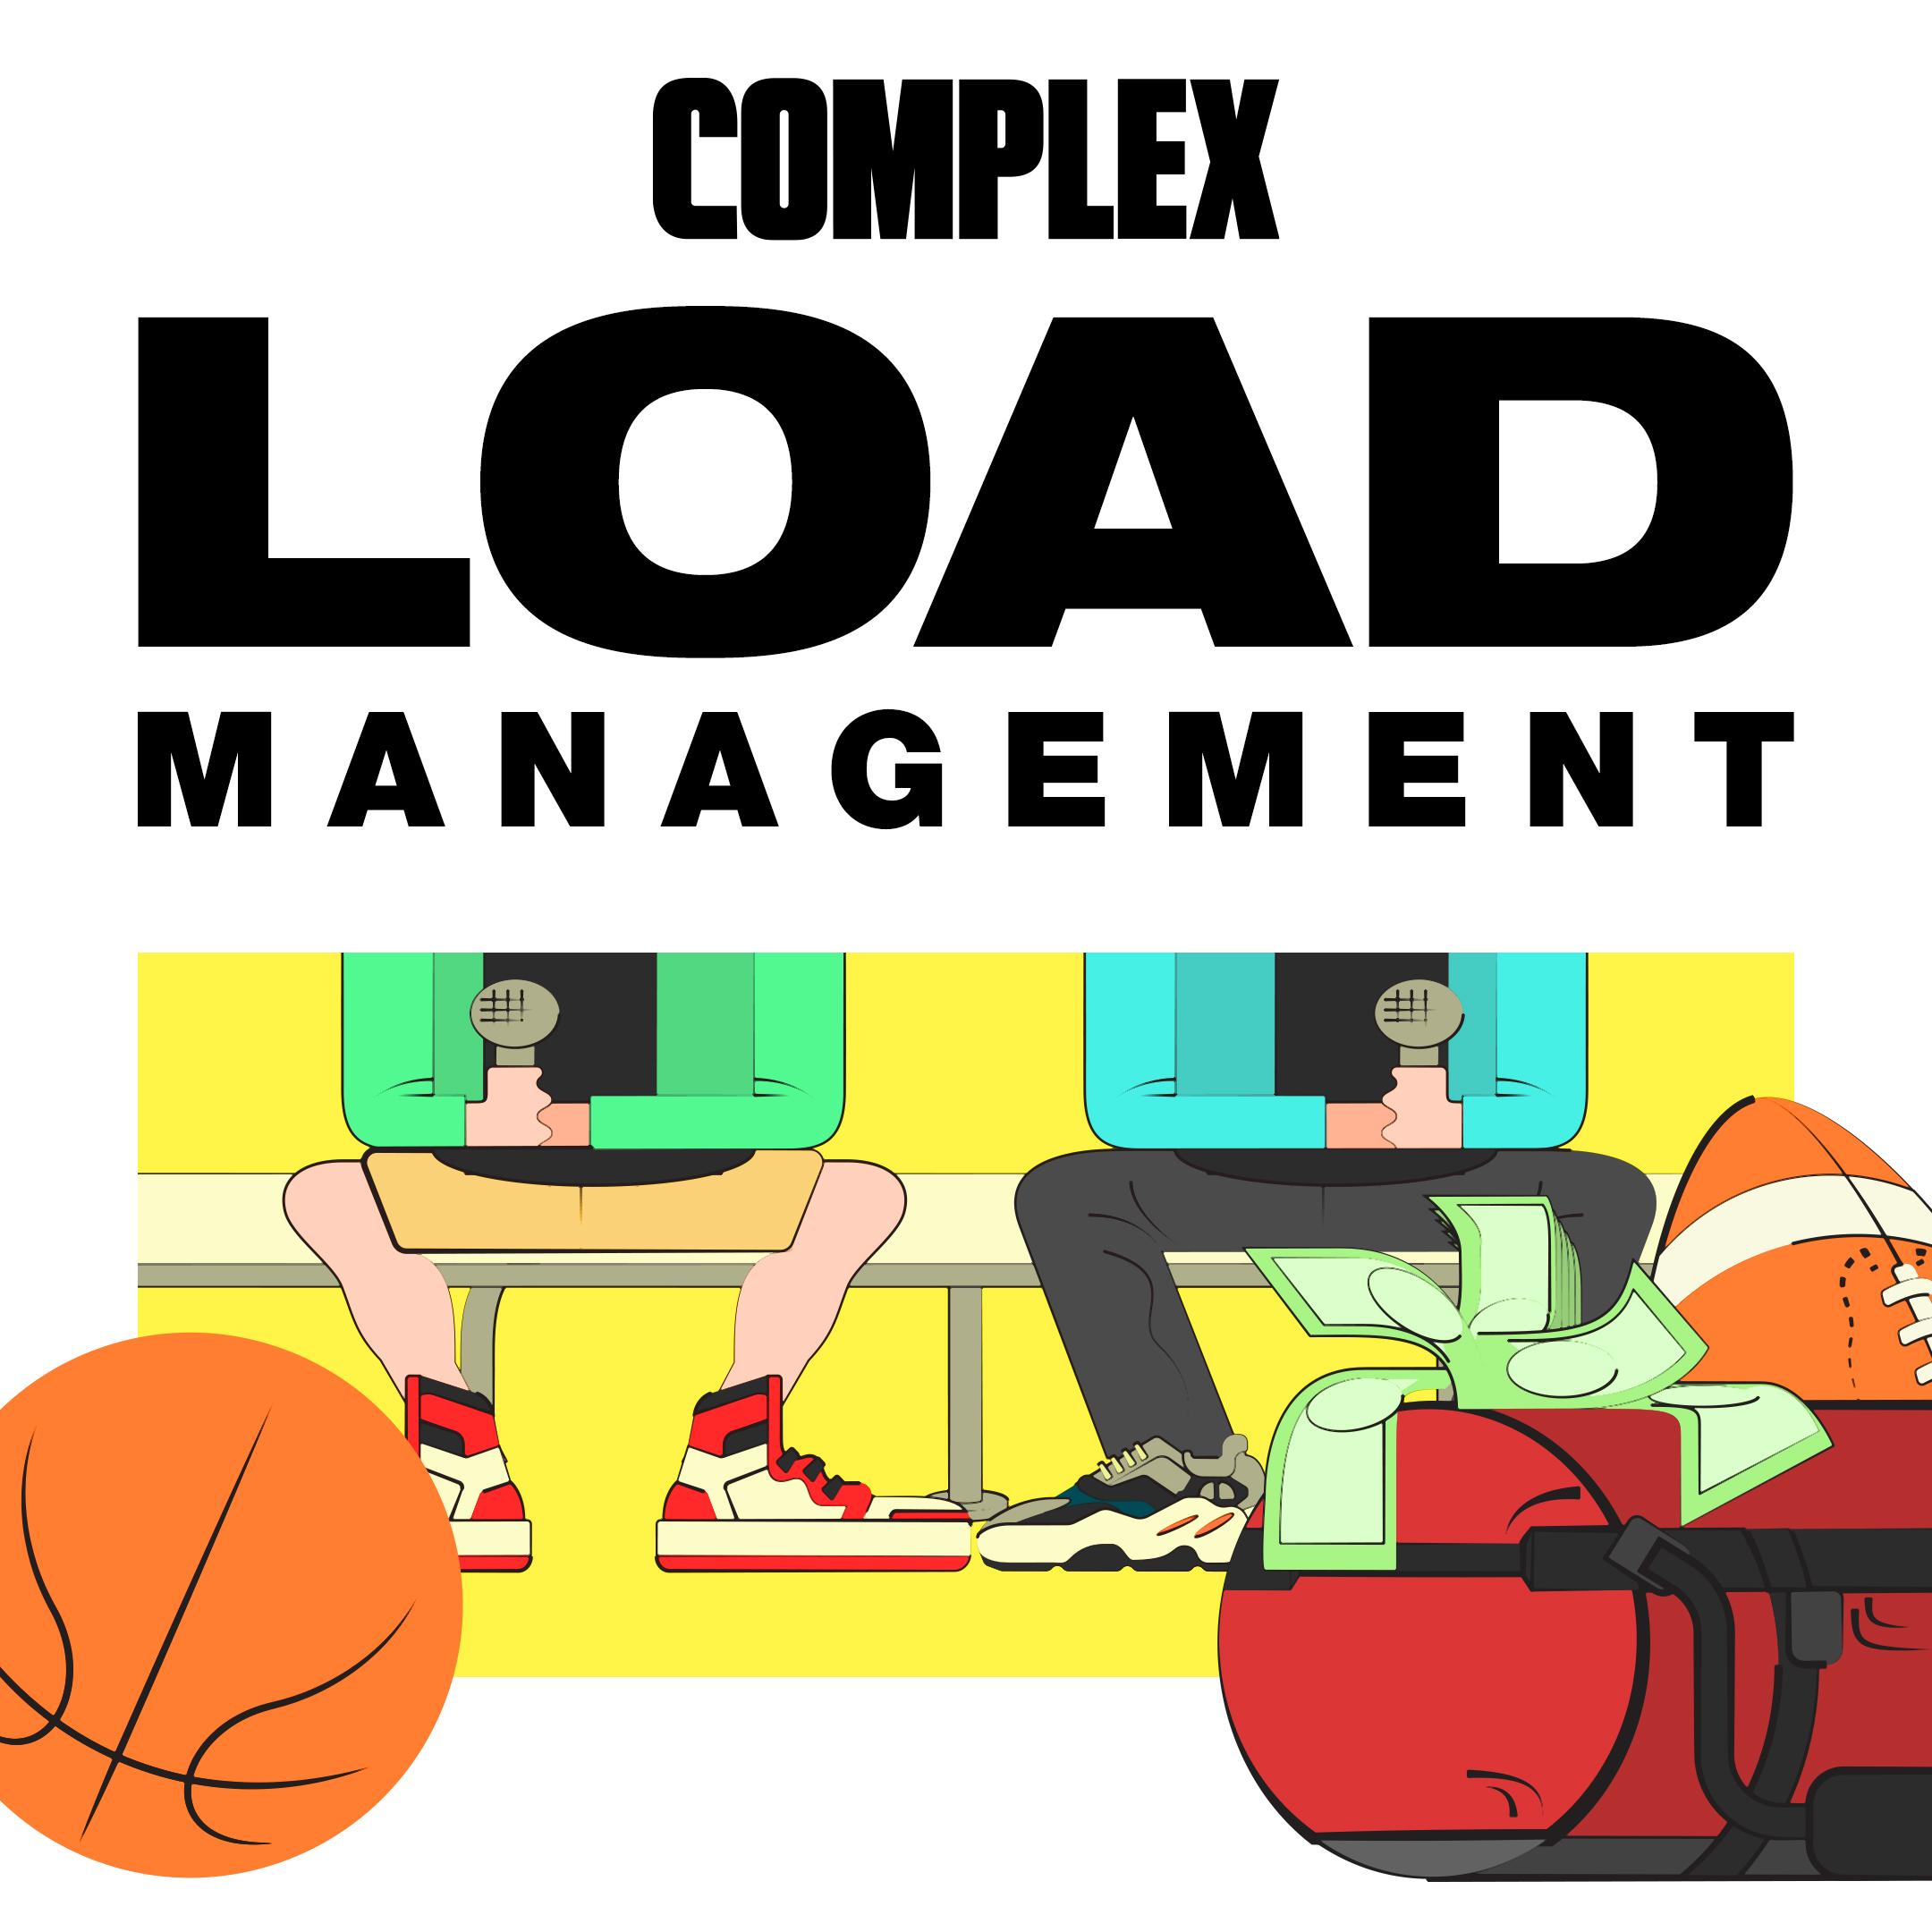 Derrick Henry Talks Stiff Arms, Racing DK Metcalf + Week 8 NFL Picks: Listen to Load Management